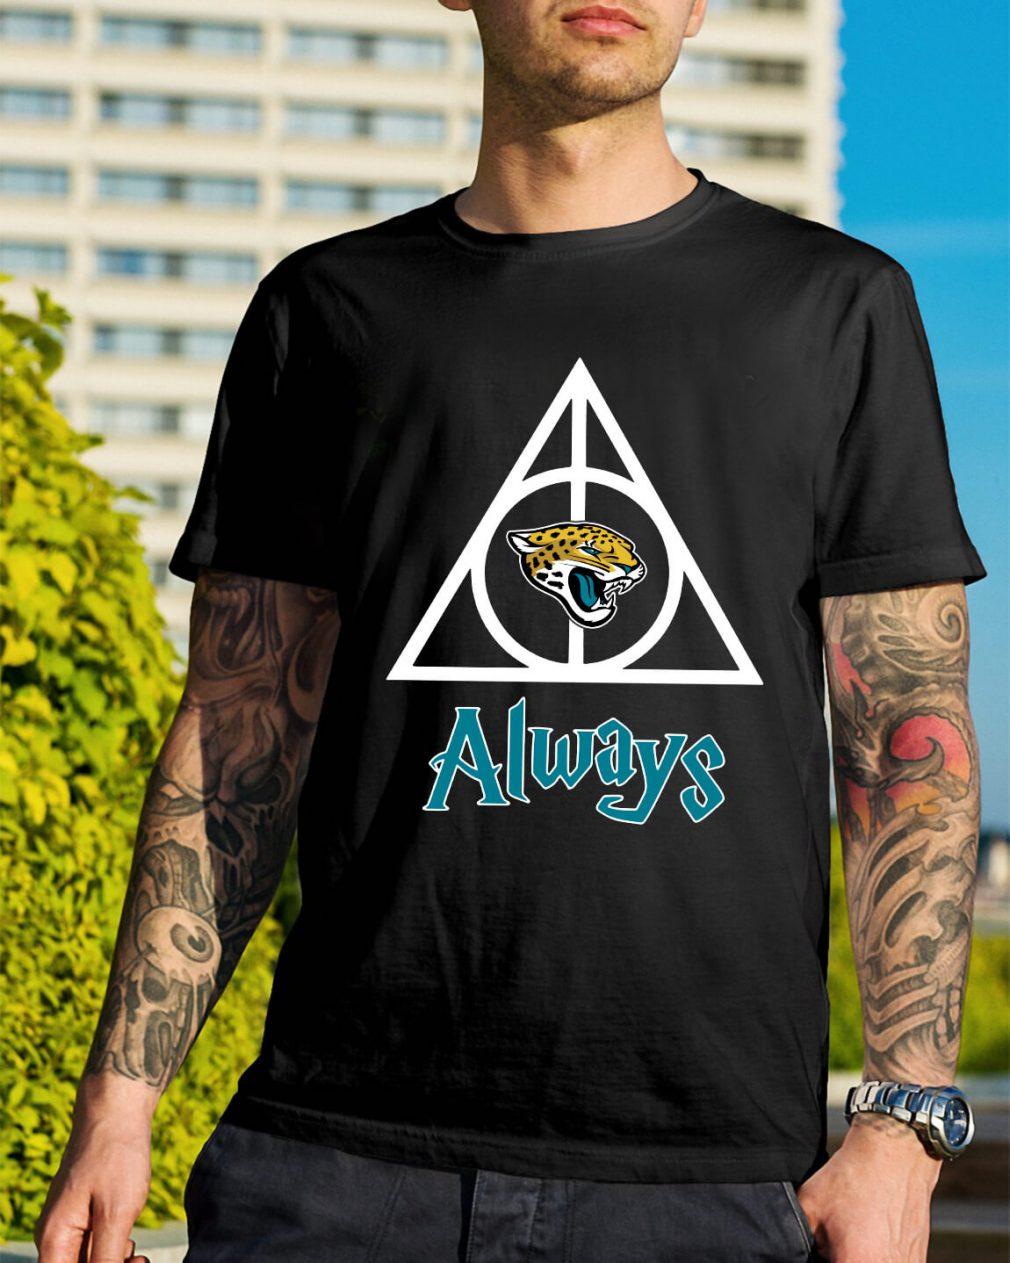 Jacksonville Jaguars Hallows always Harry Potter shirt